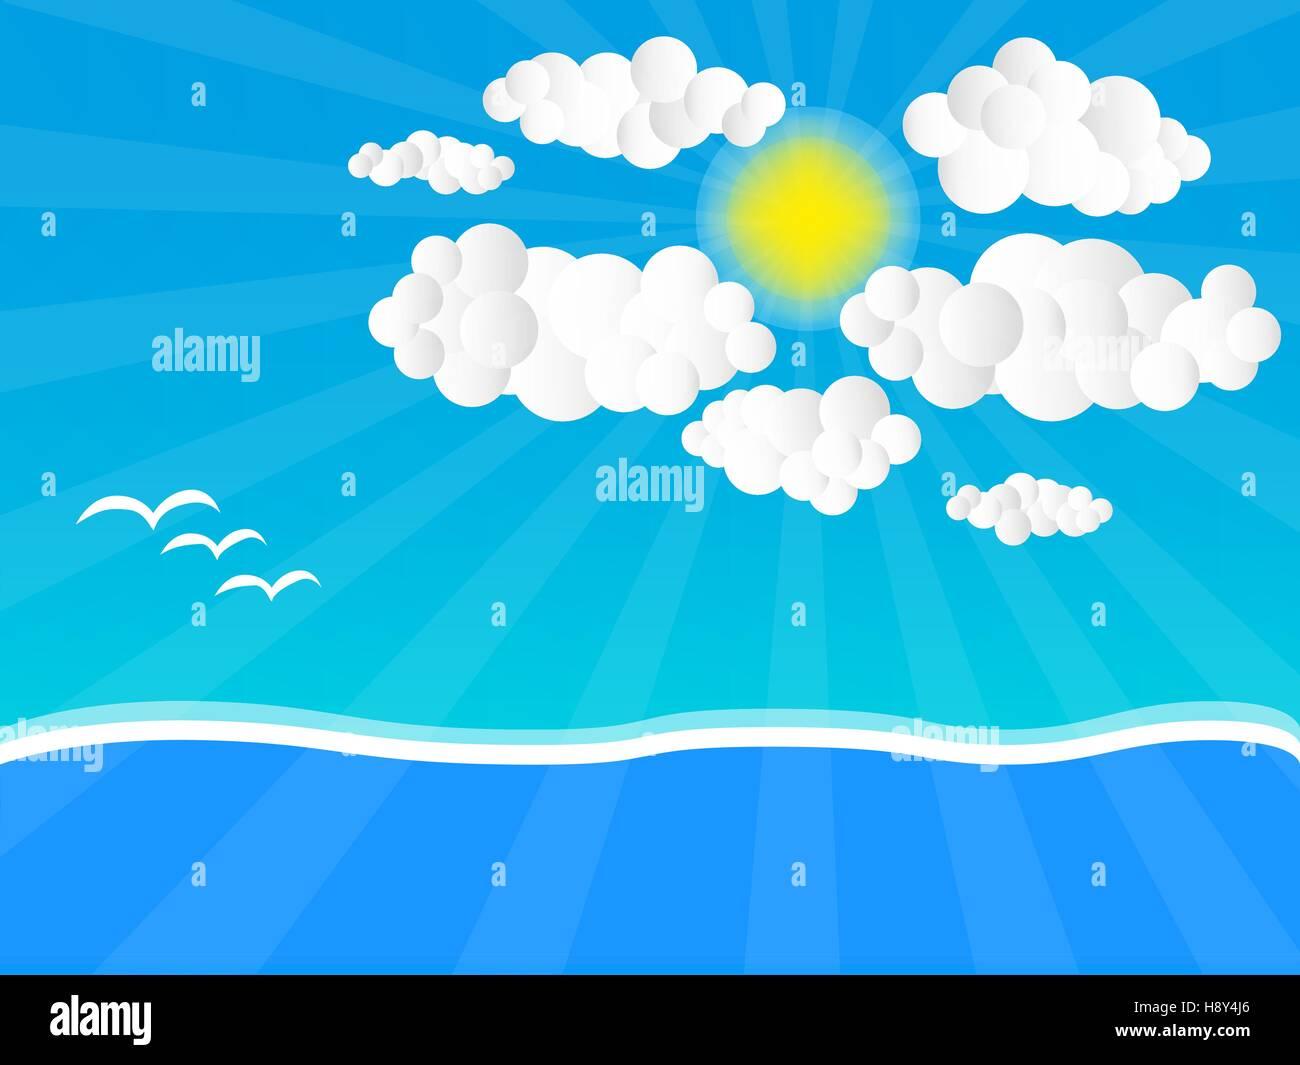 Sunny Day Vector - Stock Vector